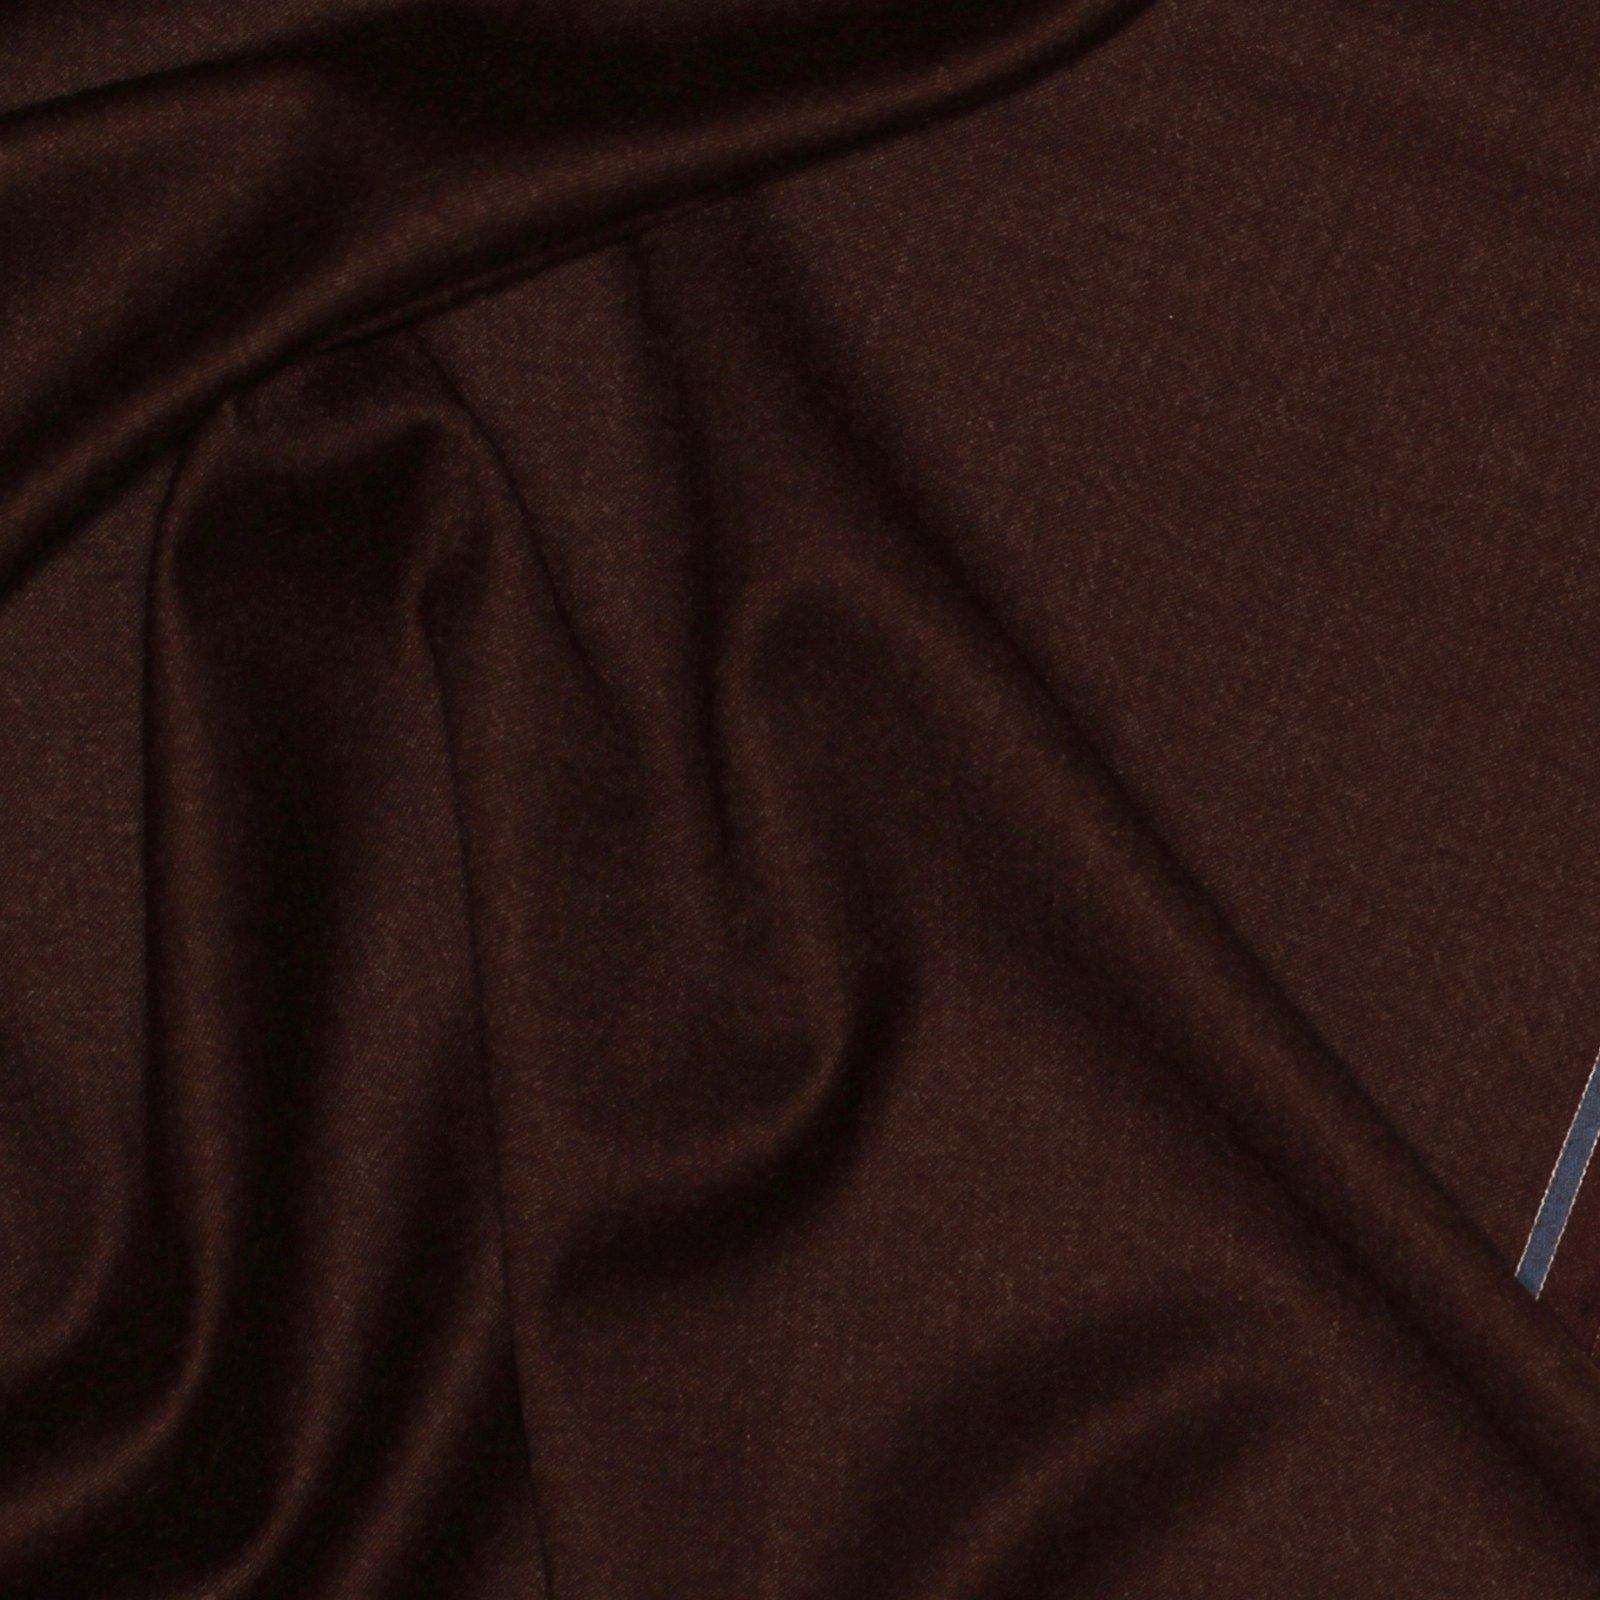 Dark Chocolate Italian Wool/Cashmere Blend; 60